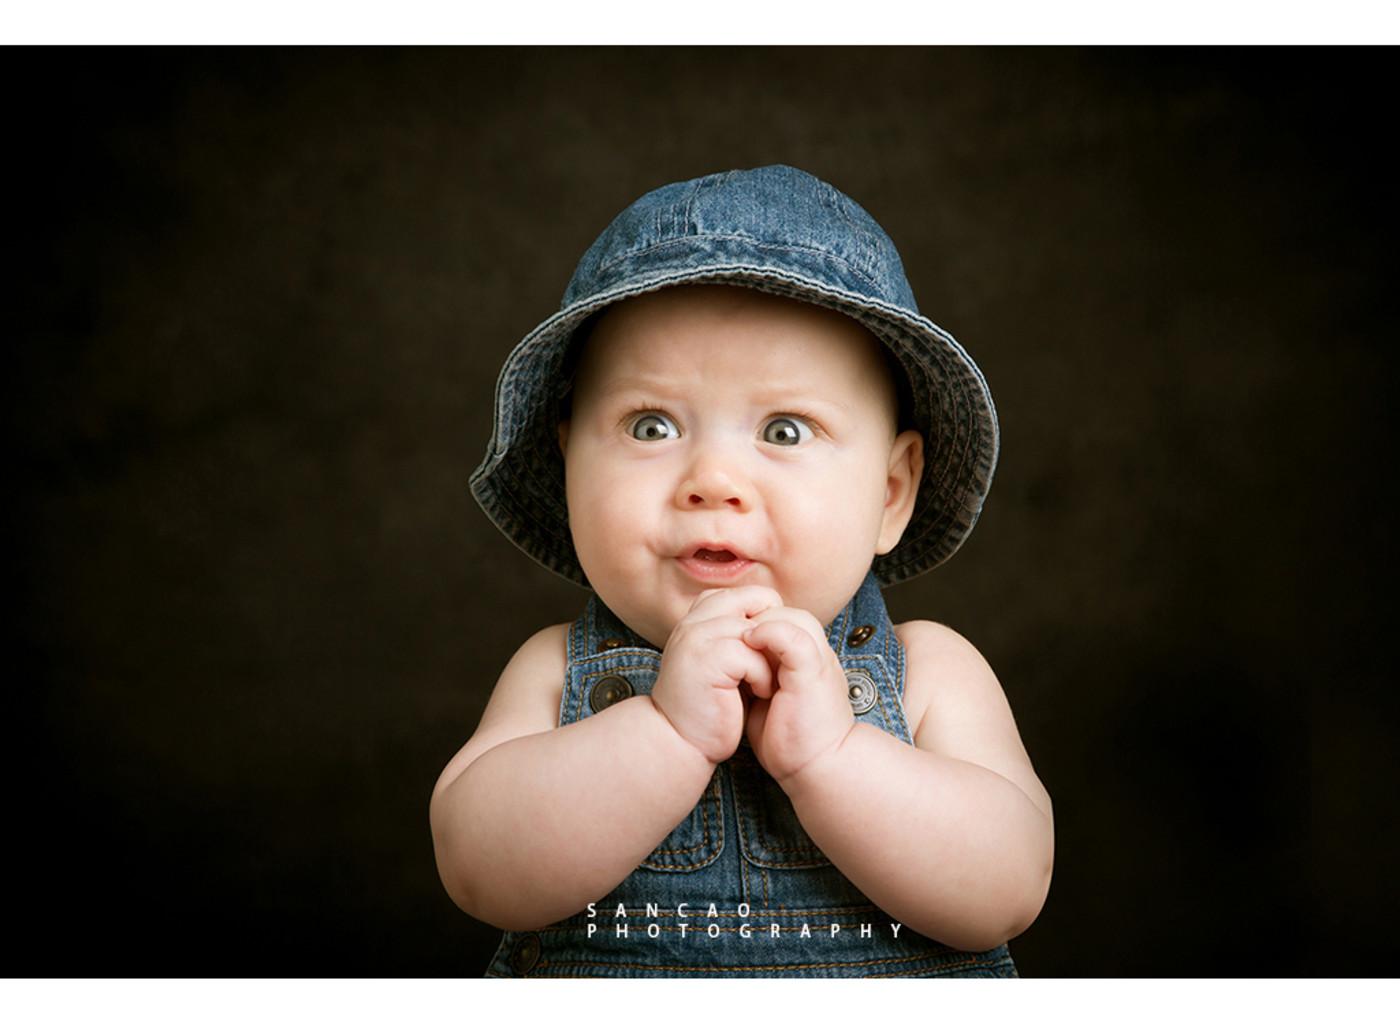 婴儿(0-6个月)9